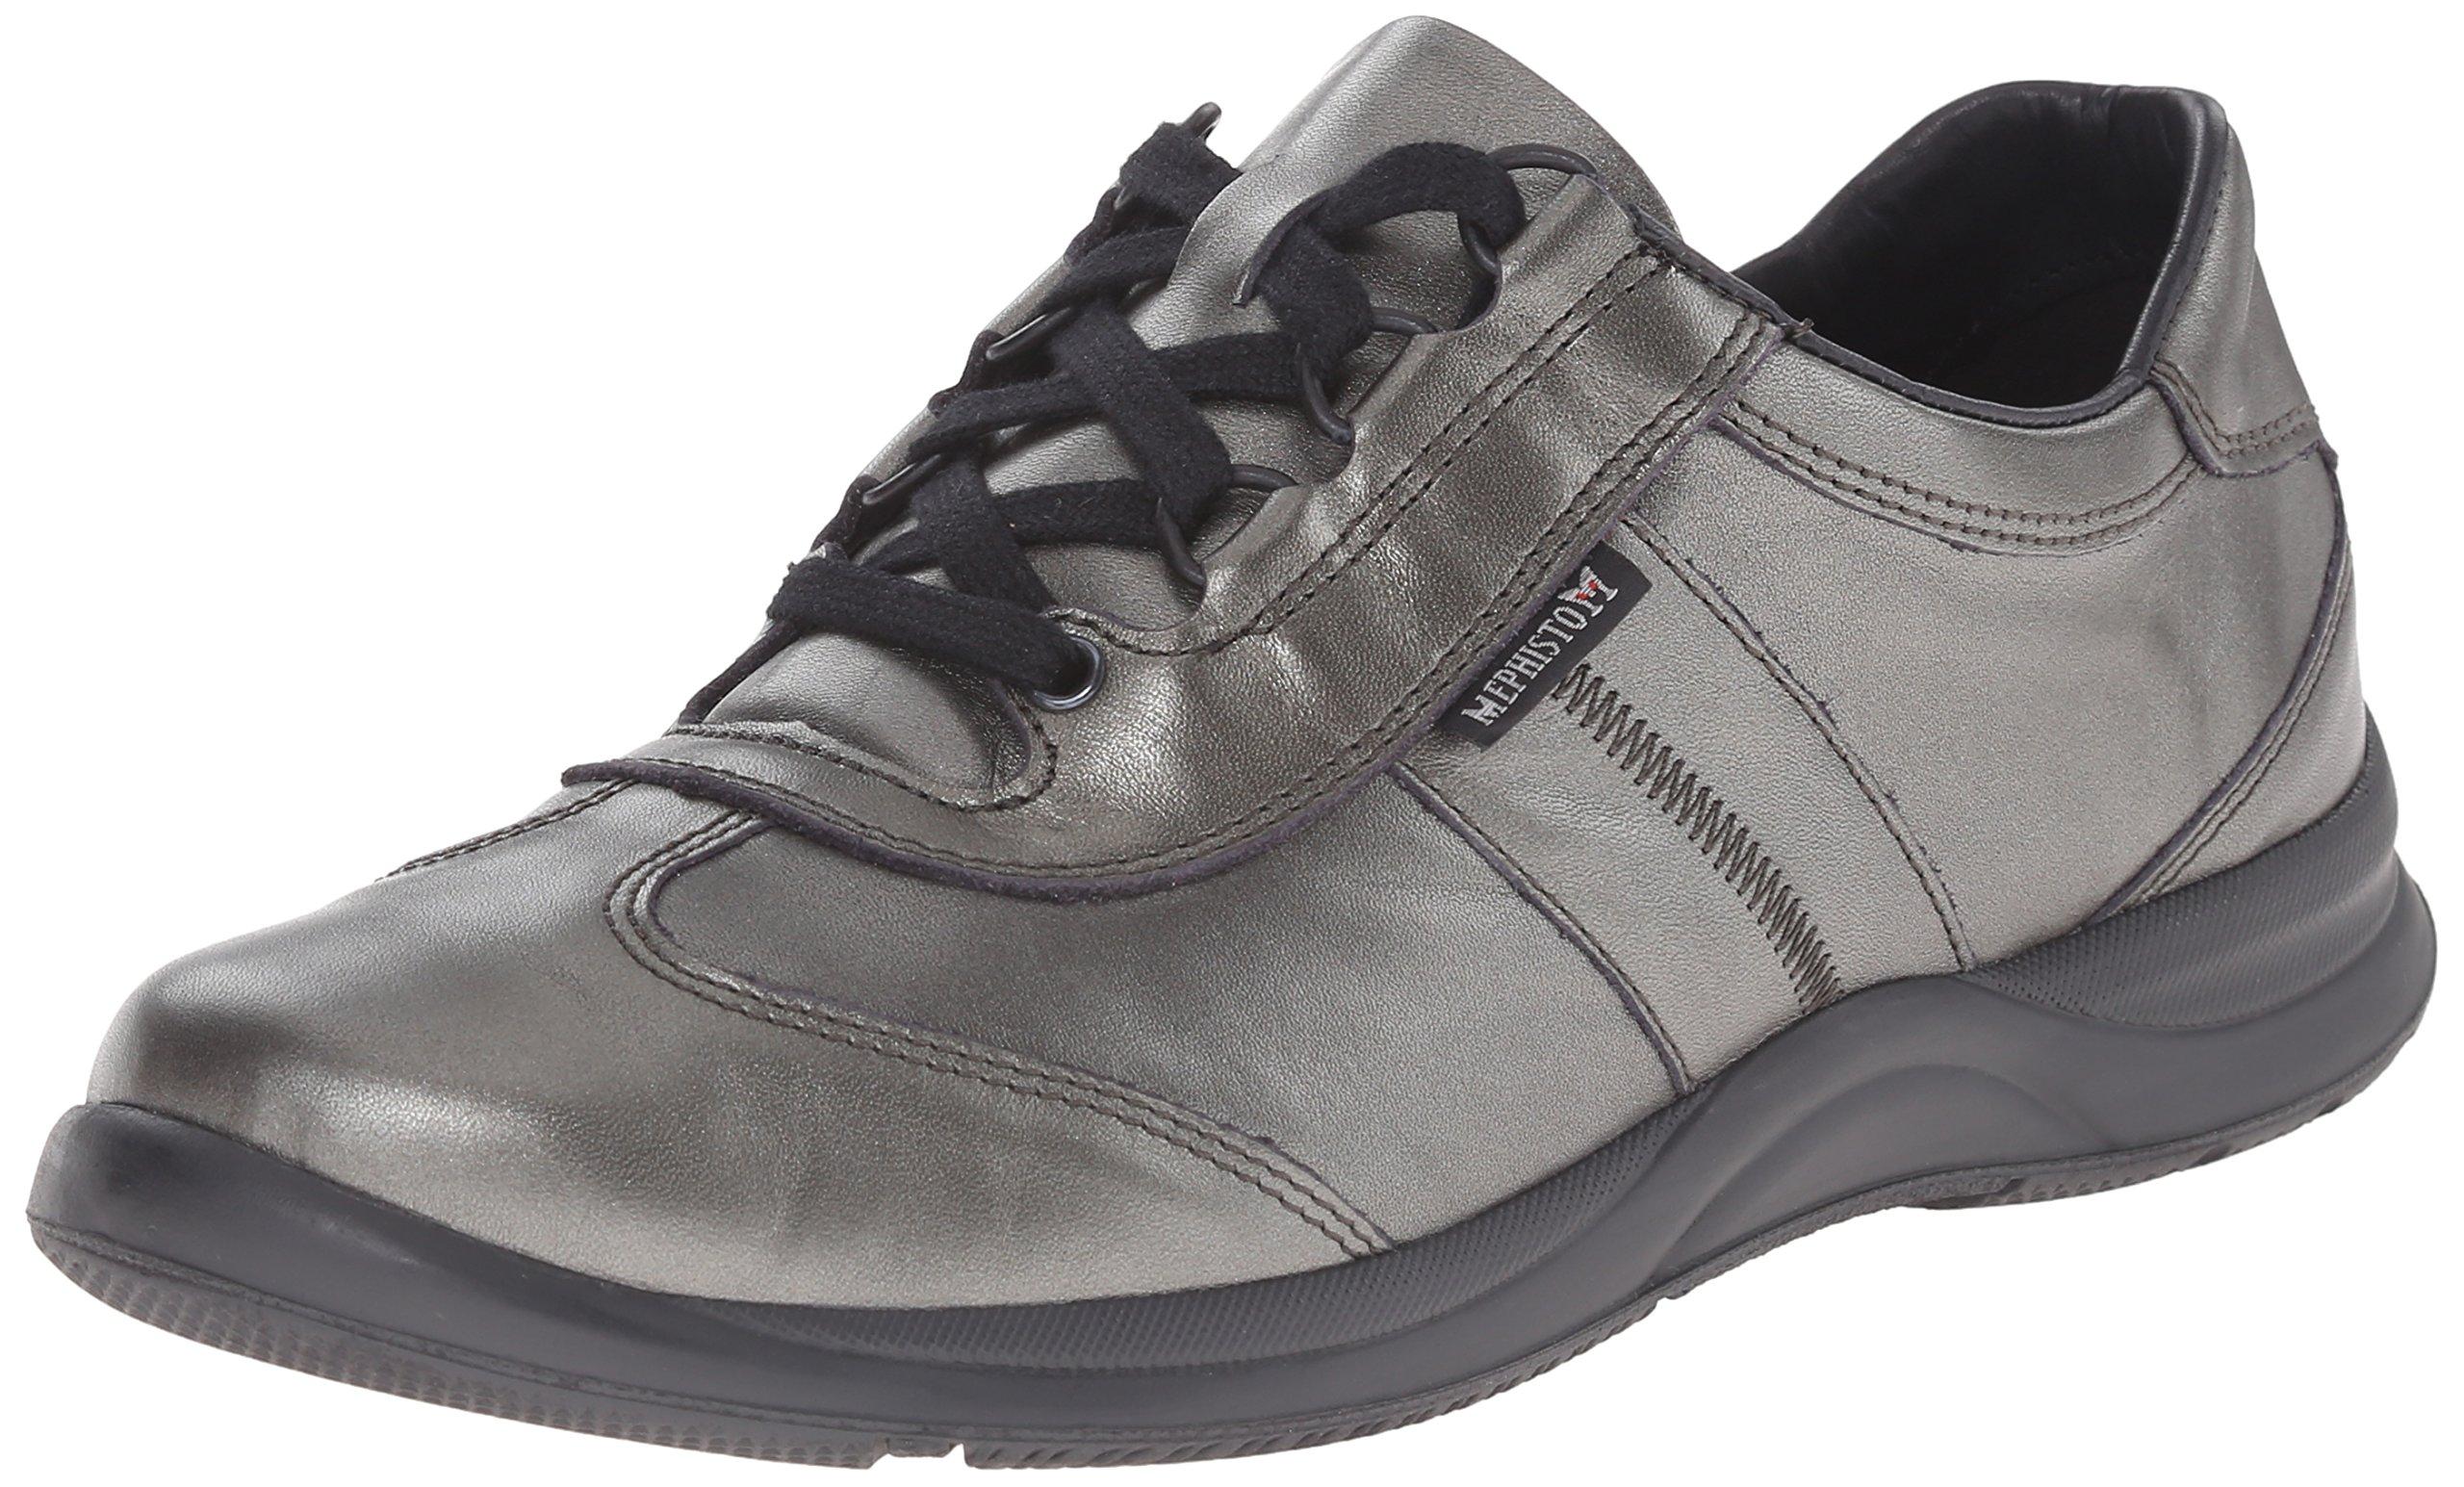 Mephisto Women's Laser Walking Shoe, Dark Grey Perl Calfskin, 8 M US